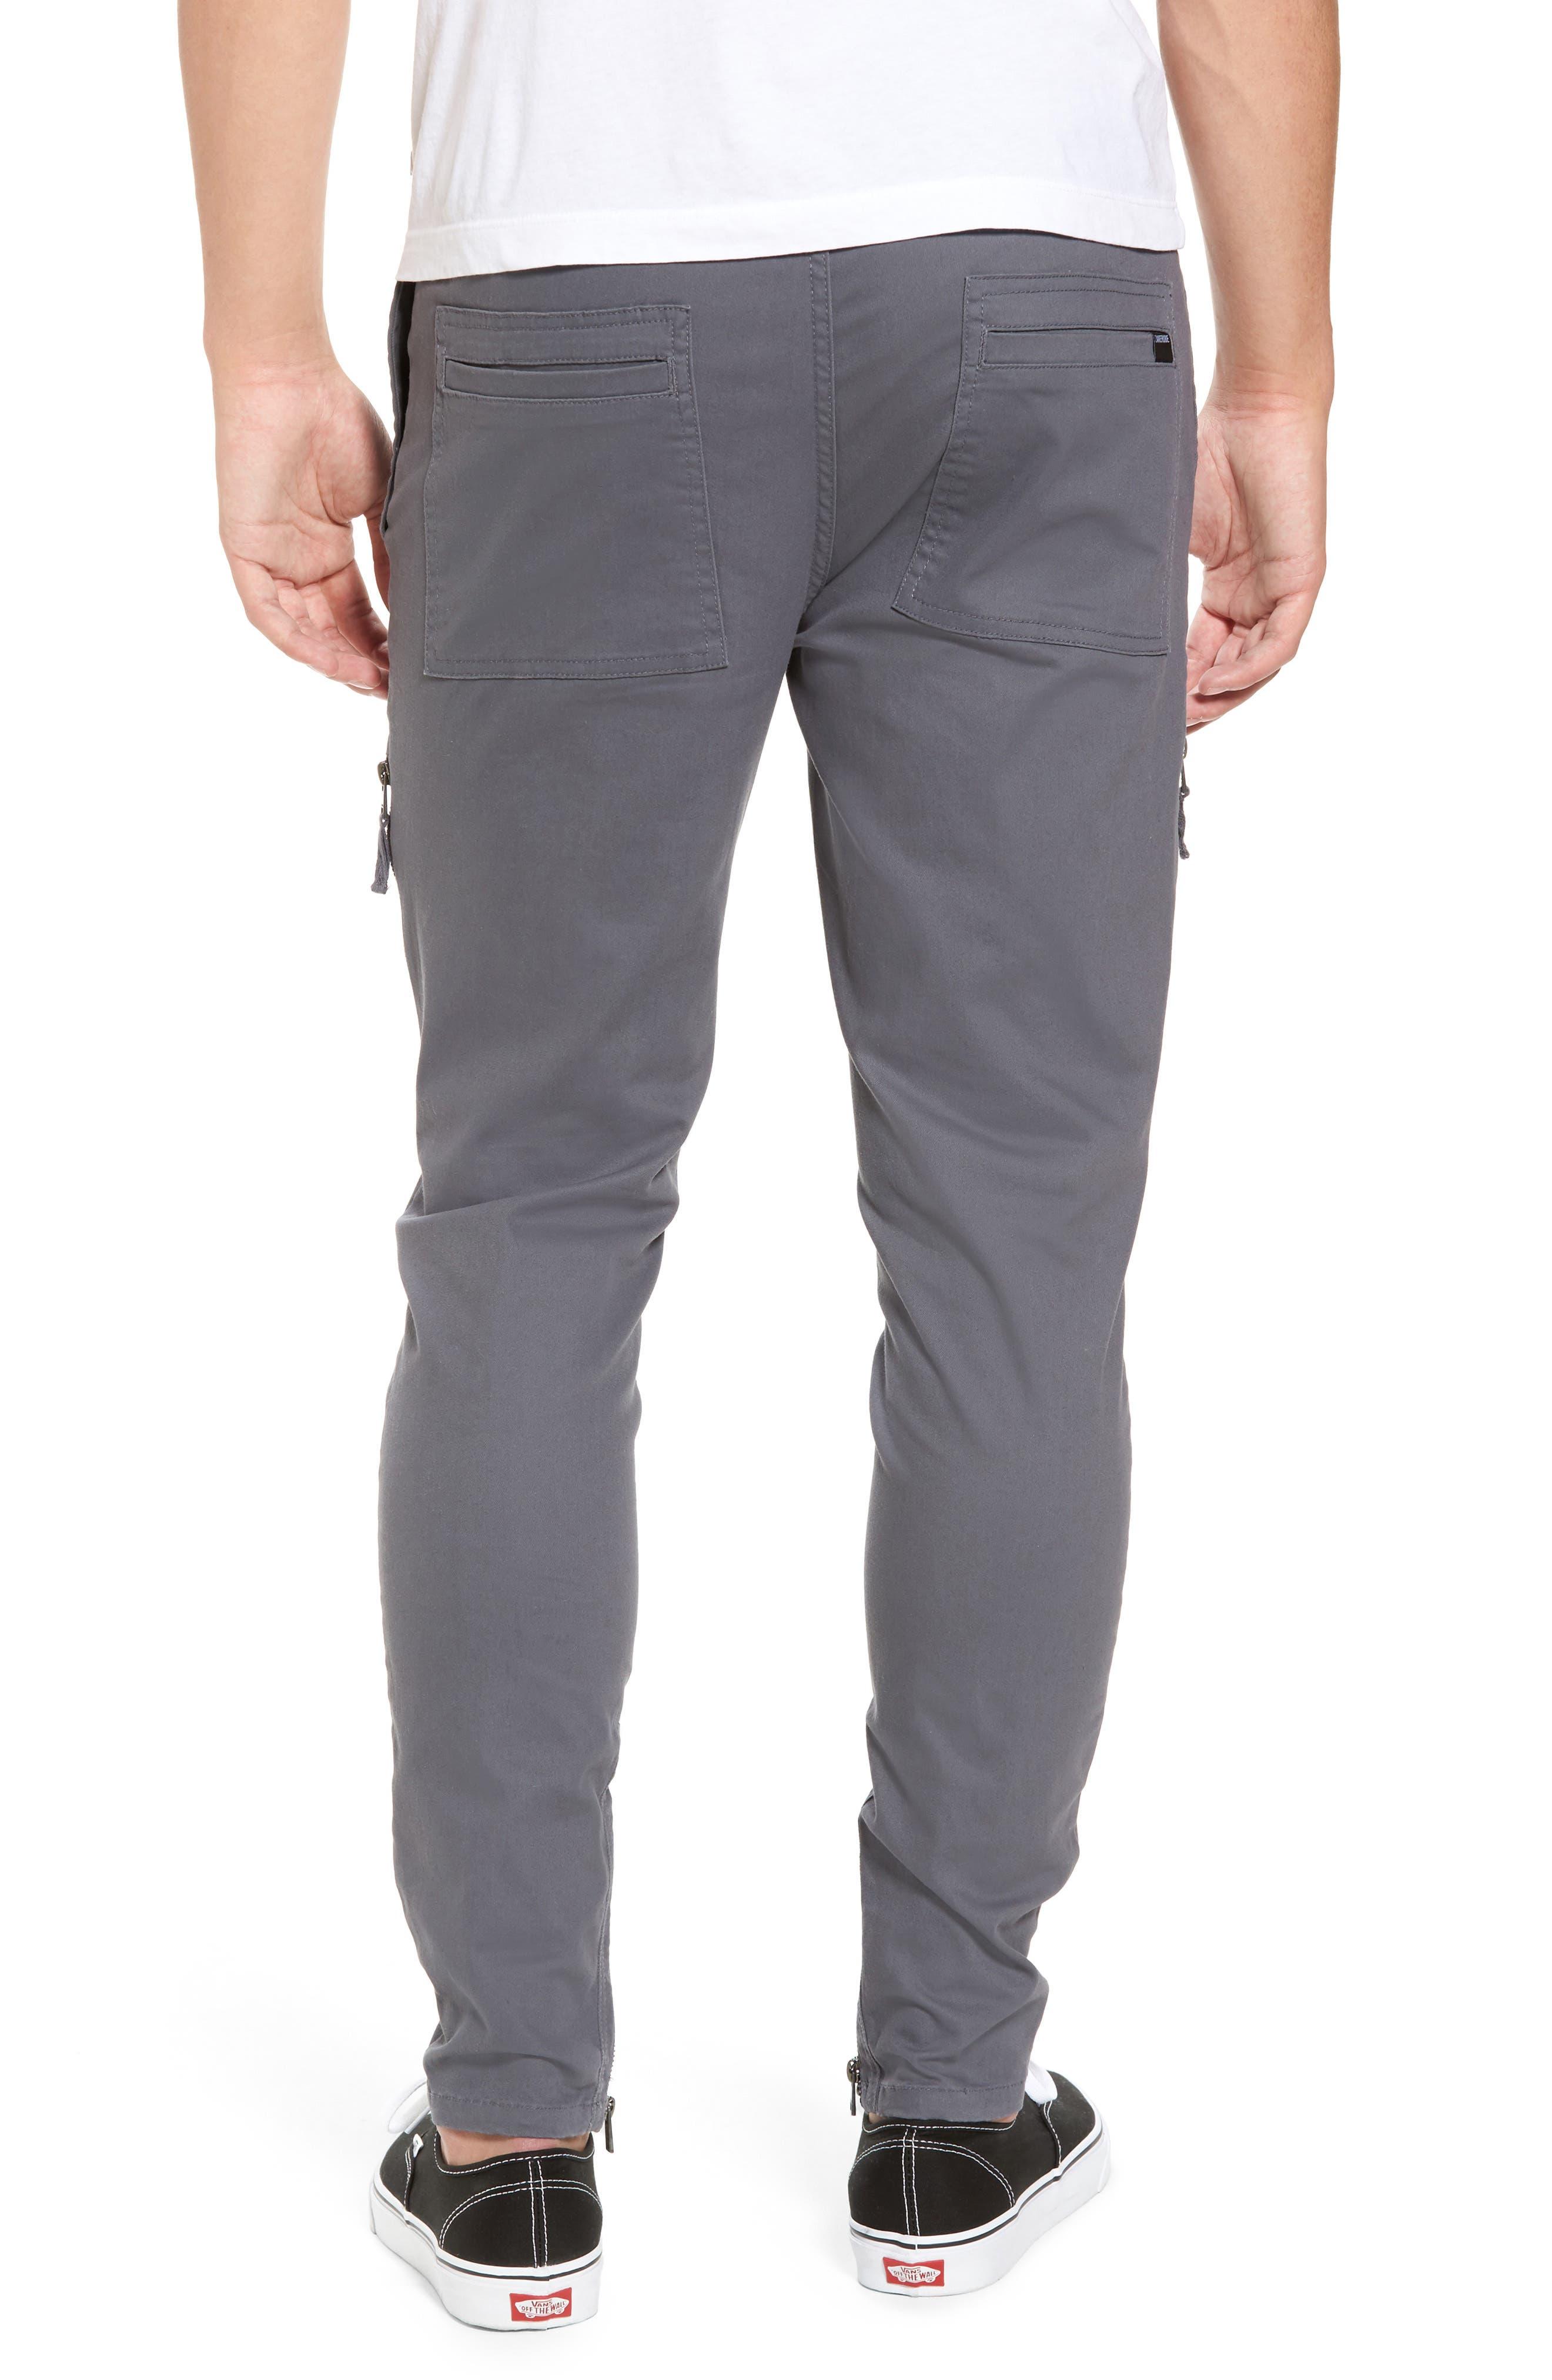 Sureshot Jogger Pants,                             Alternate thumbnail 2, color,                             Grey